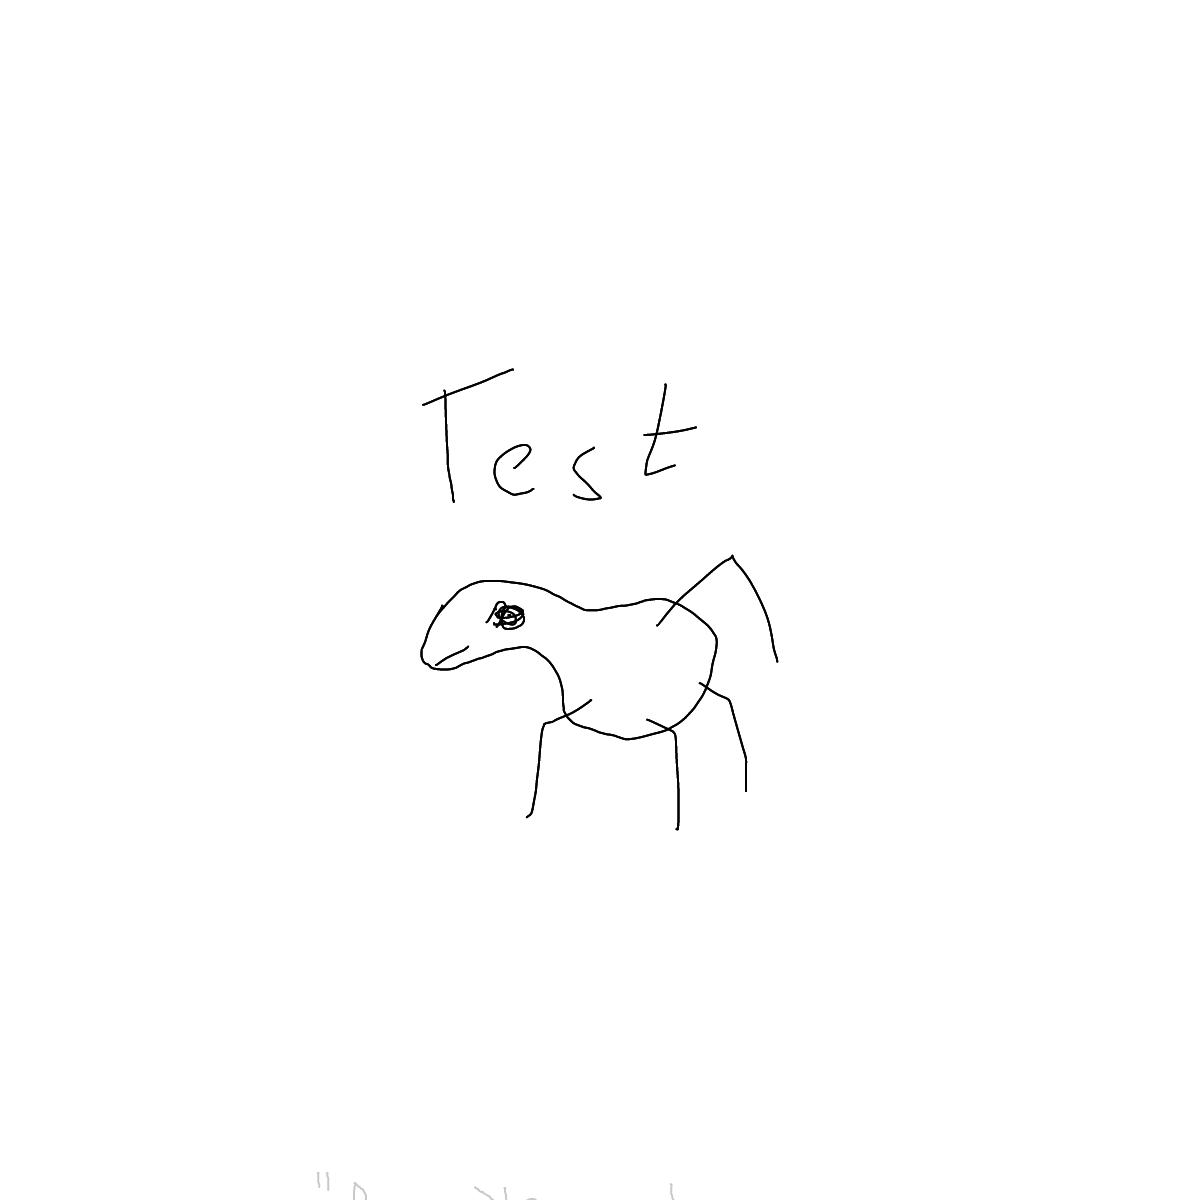 BAAAM drawing#22672 lat:51.5004425048828100lng: -0.1236388310790062